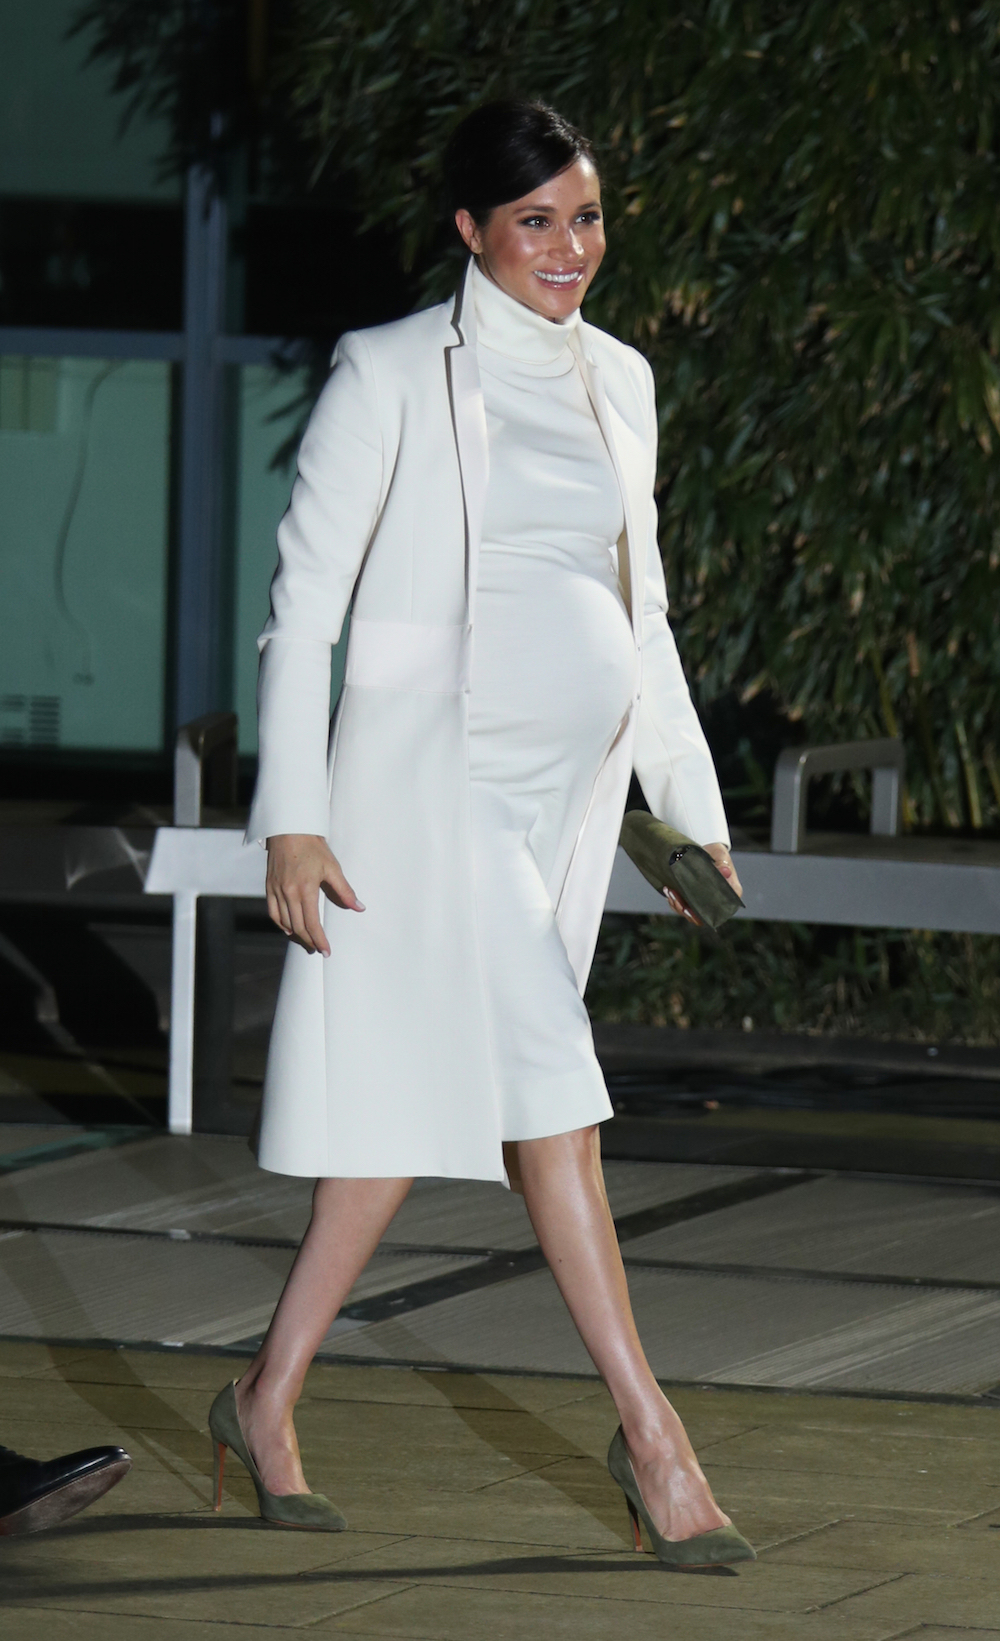 Meghan has worn the cream Amanda Wakeley 'Crombie' coat several times before